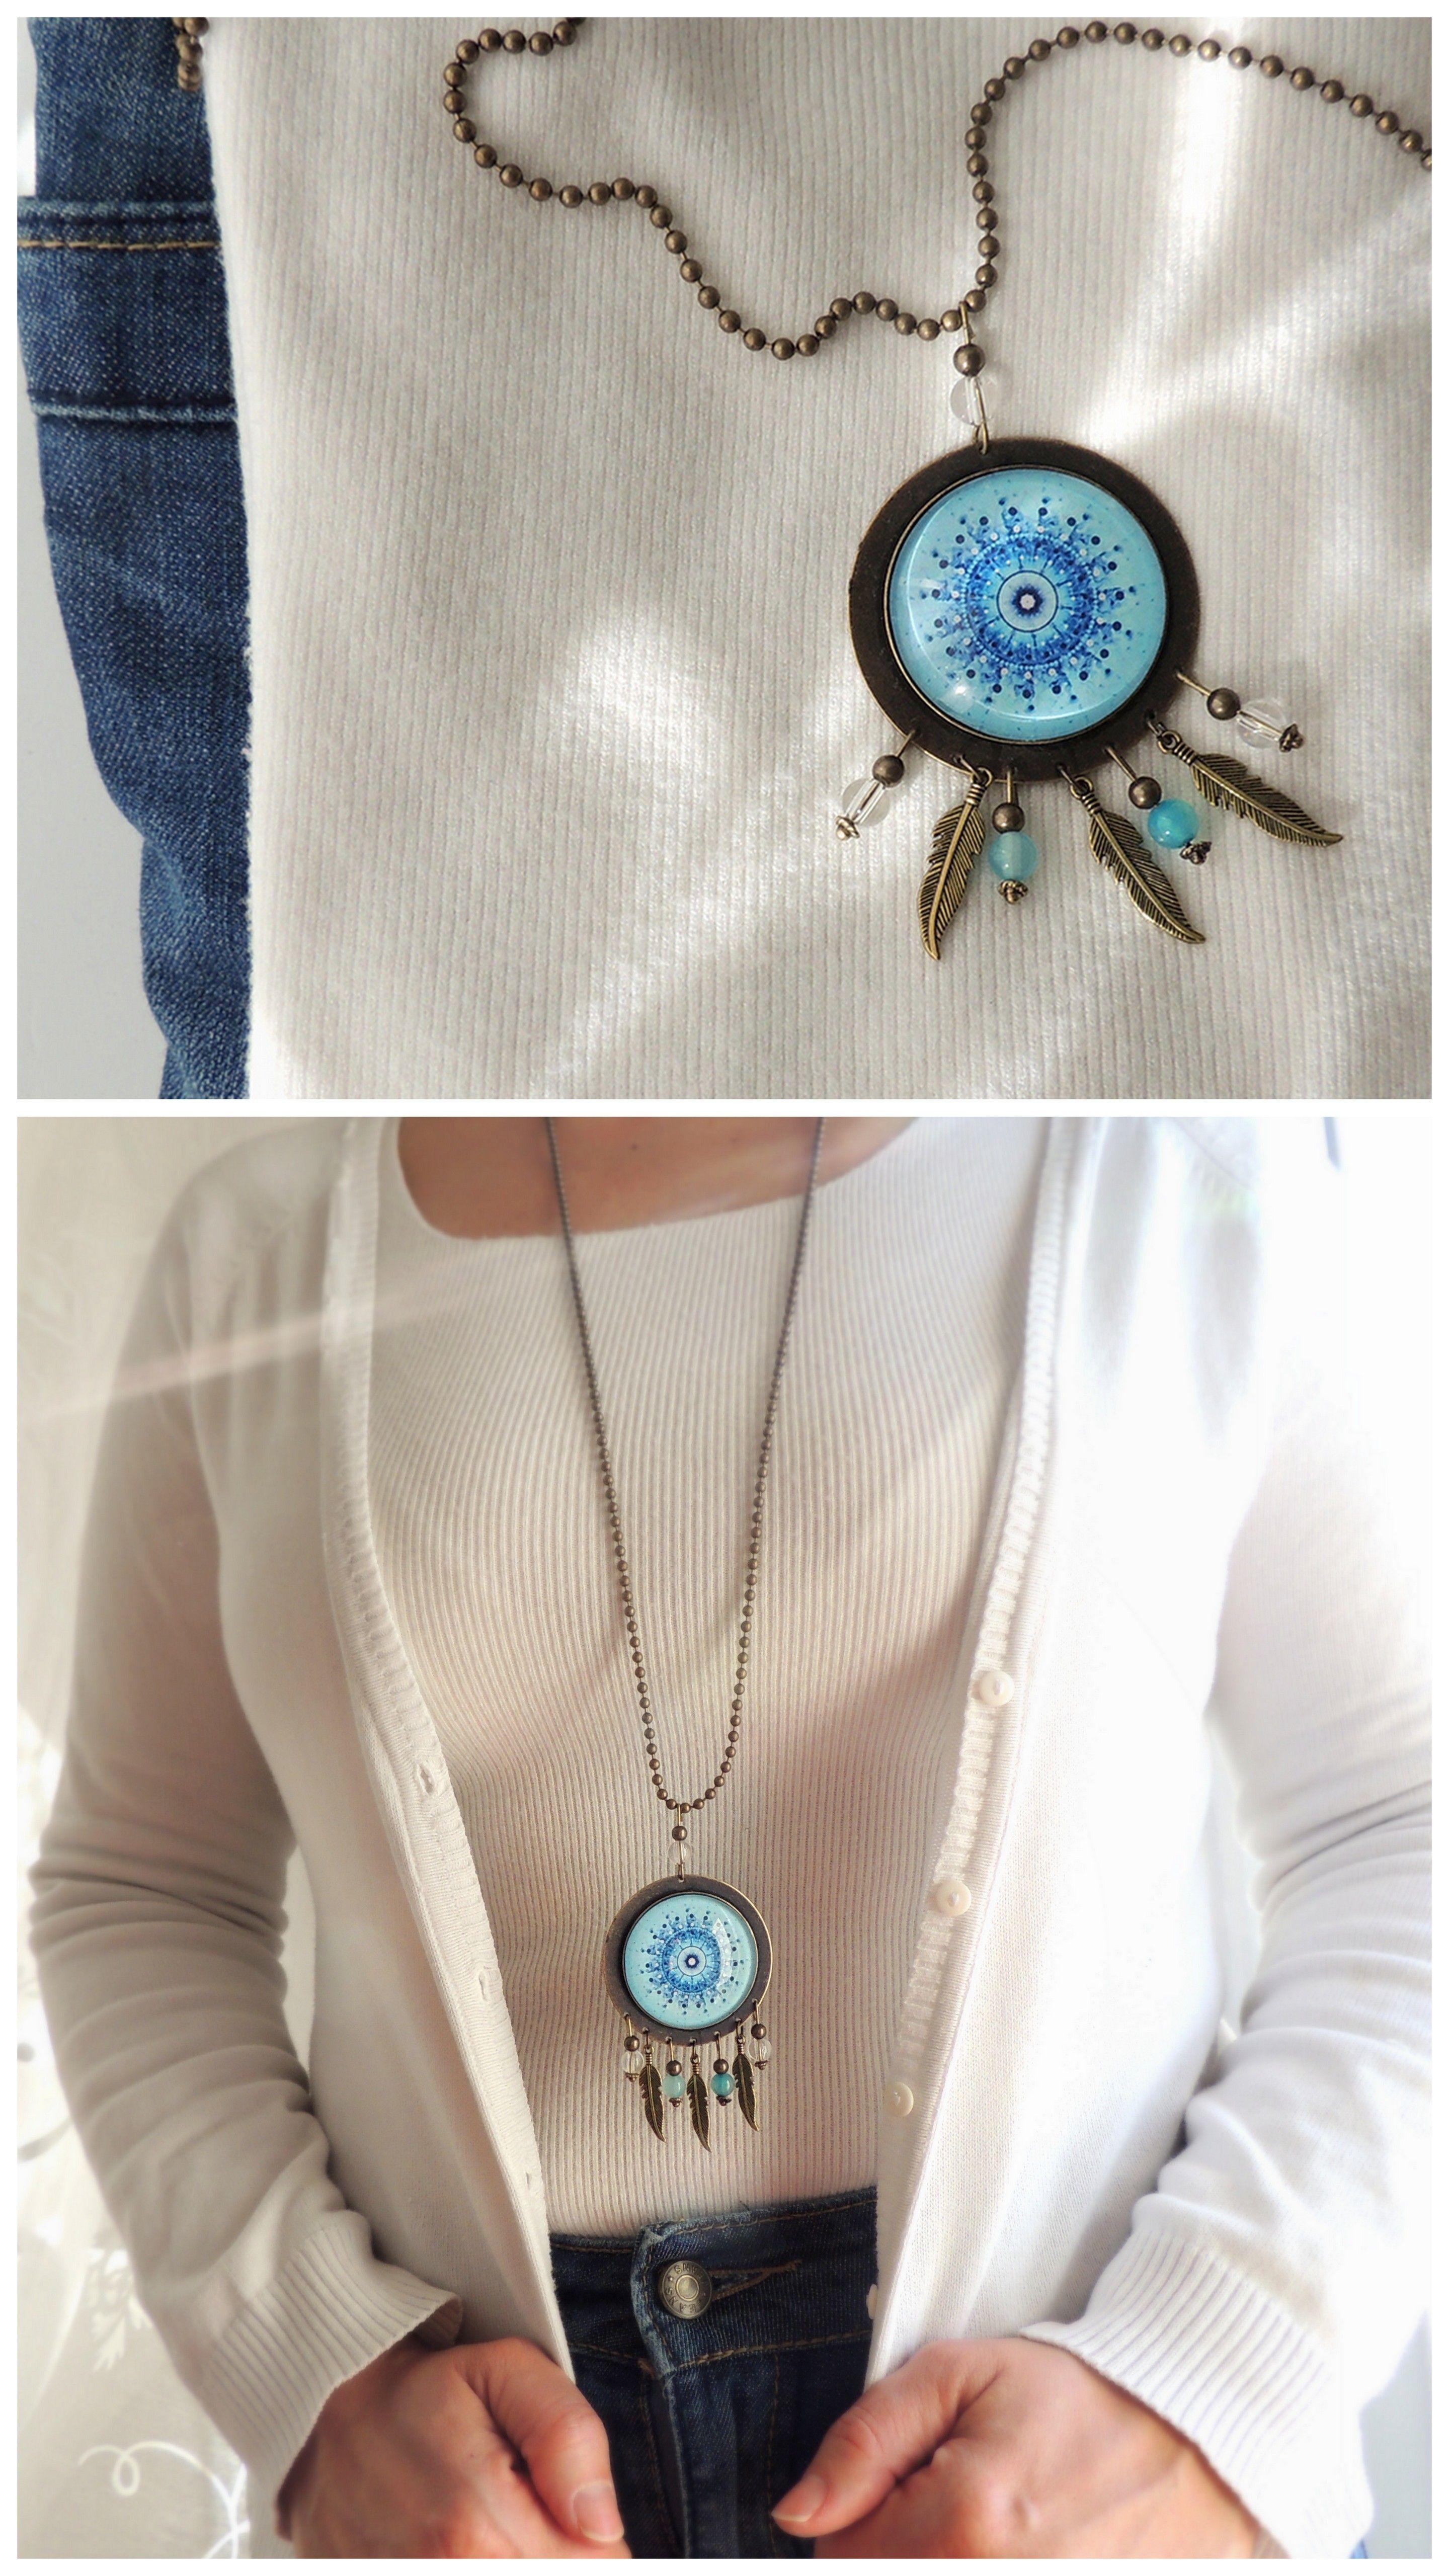 Dream Catcher Necklace Meaning Dreamcatcher Necklace ICE MANDALA Blue Sky Mandala Jewelry with 33